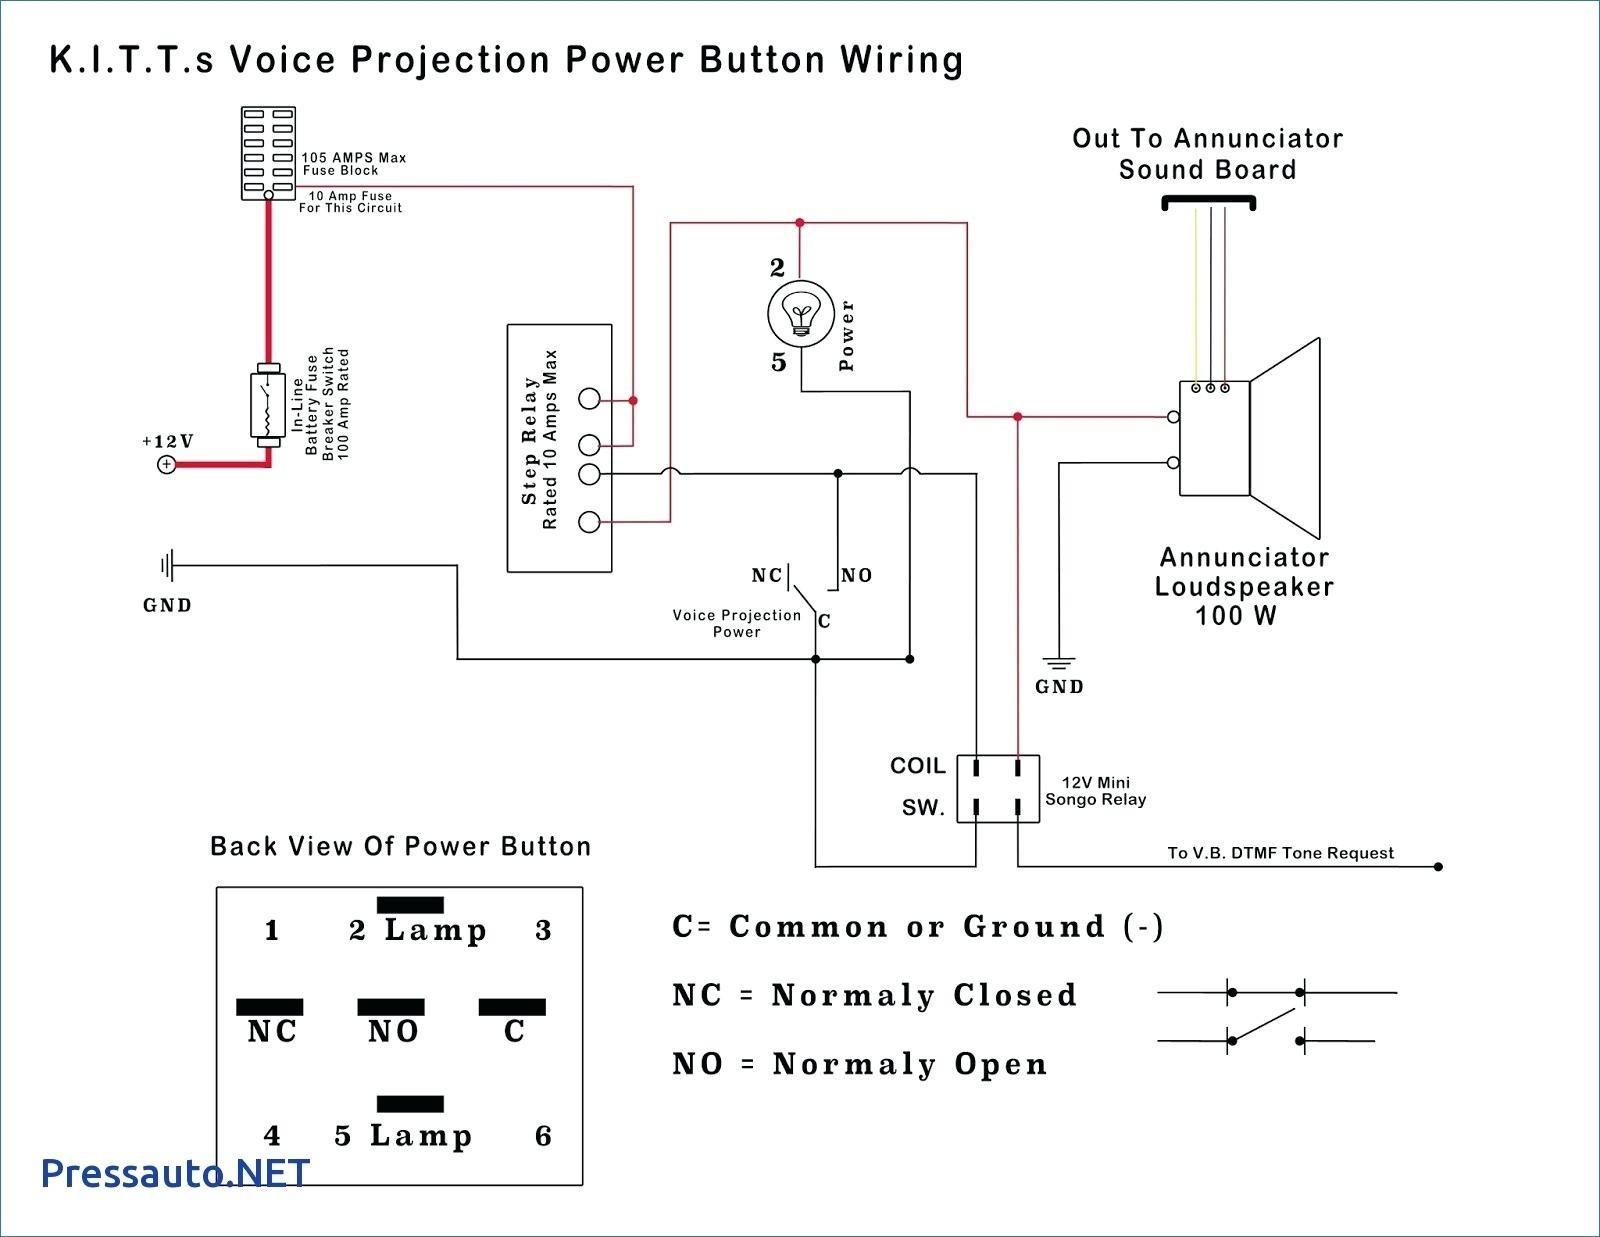 7 3 Powerstroke Glow Plug Wiring Diagram Fresh Wiring Diagram Glow Plug Relay 7 3 Fresh Glow Plug Relay Wiring